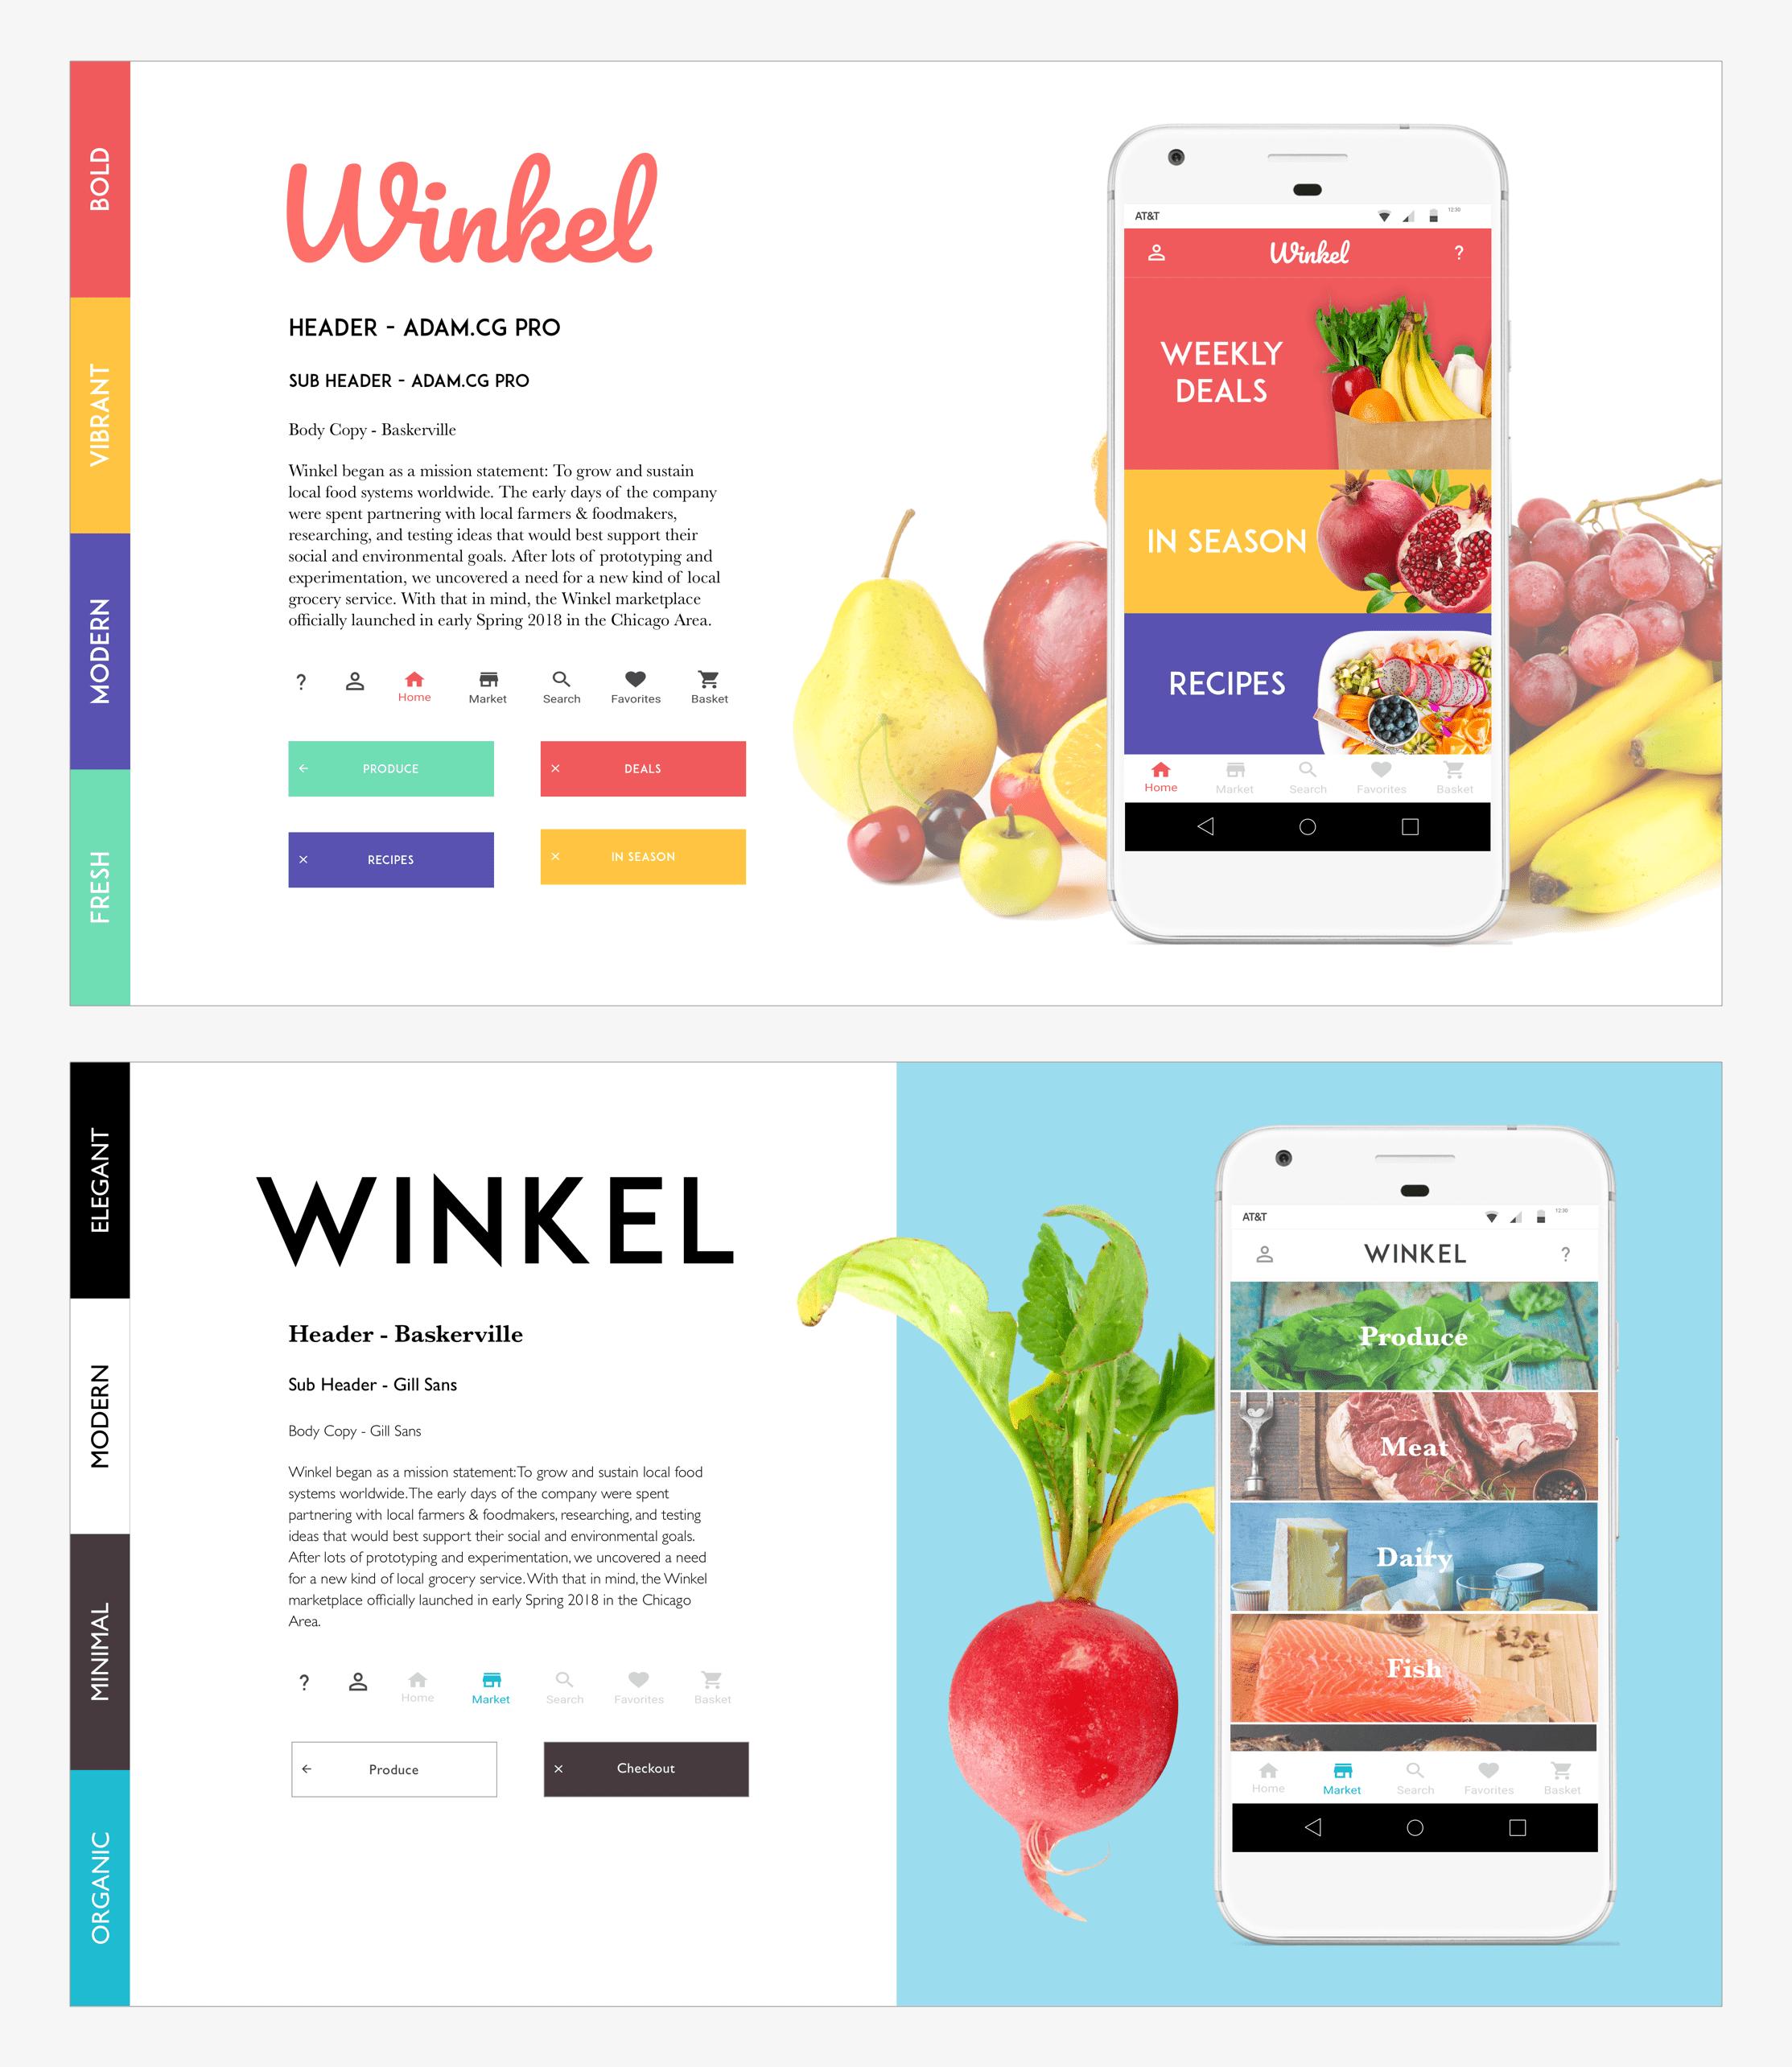 Wink_StyleGuide-min.png